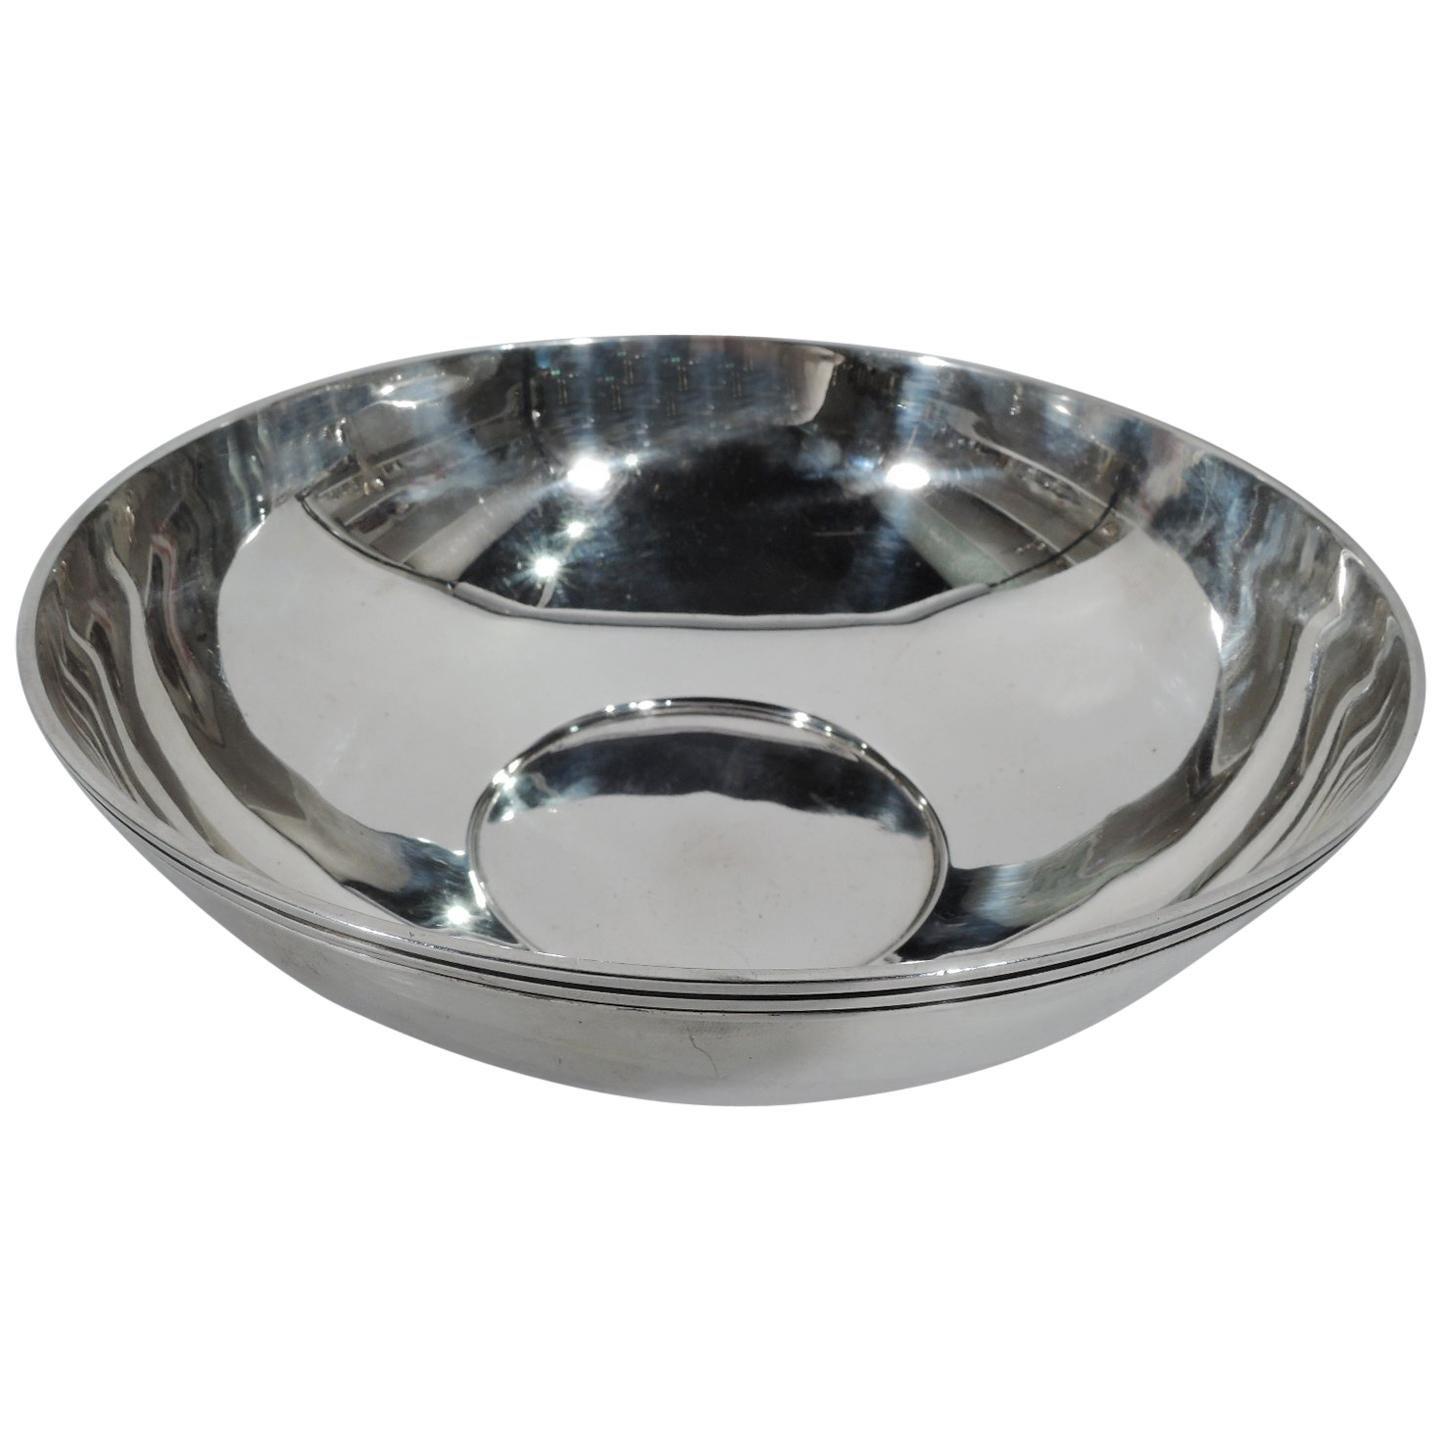 Tiffany Mid-Century Modern Sterling Silver Bowl